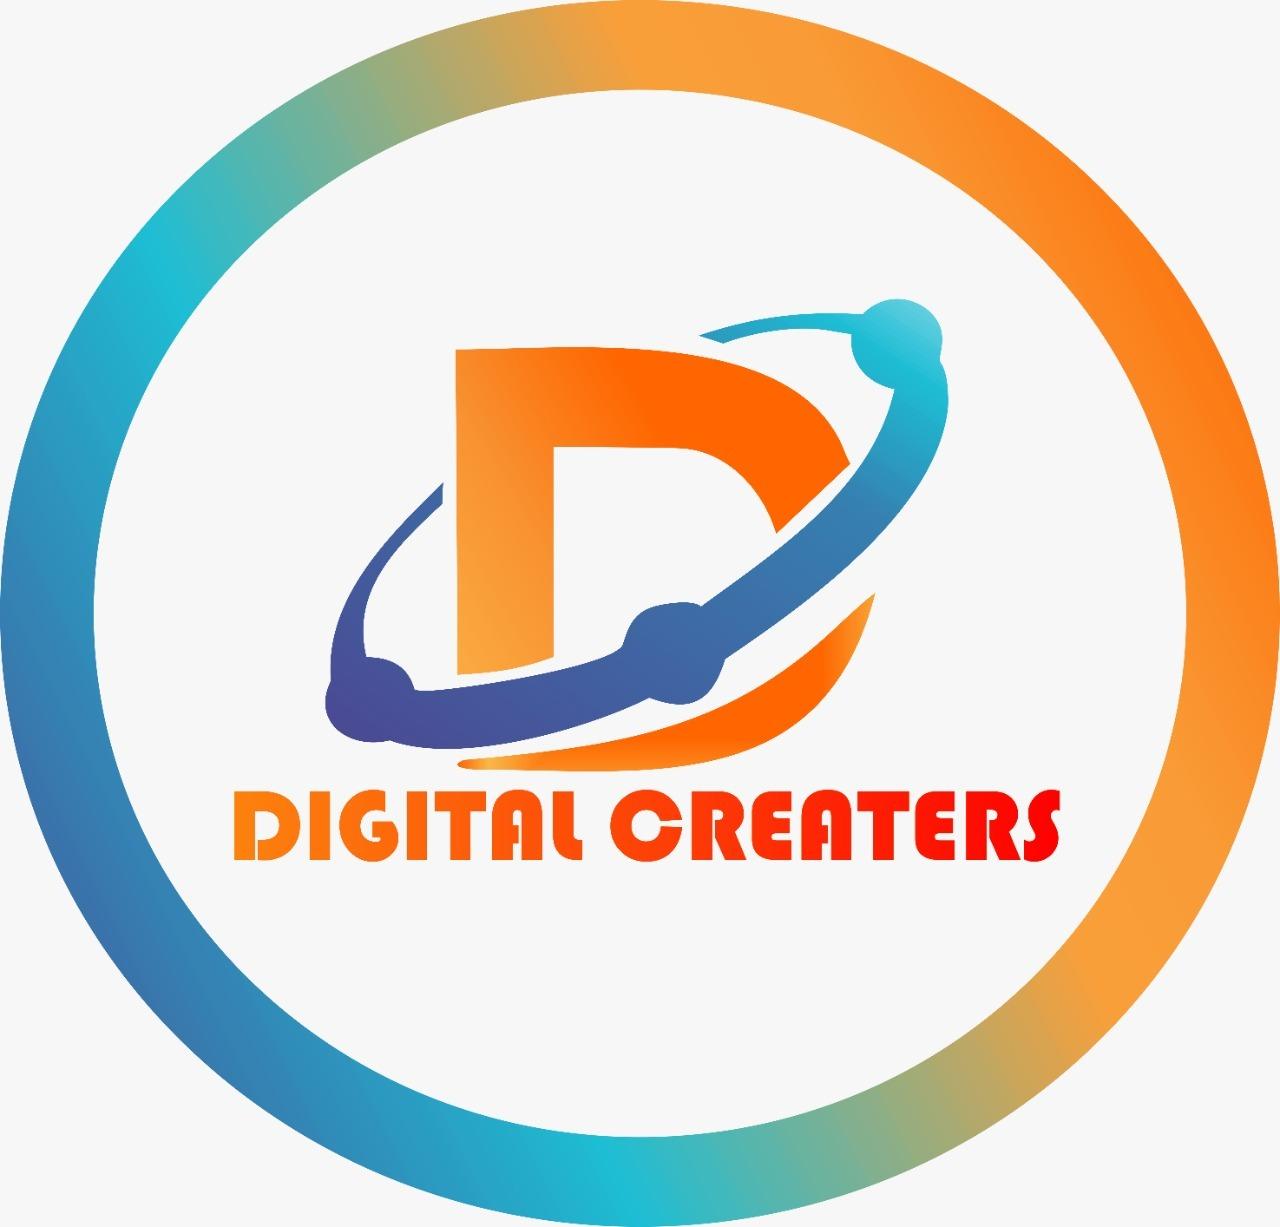 DigitalCreaters